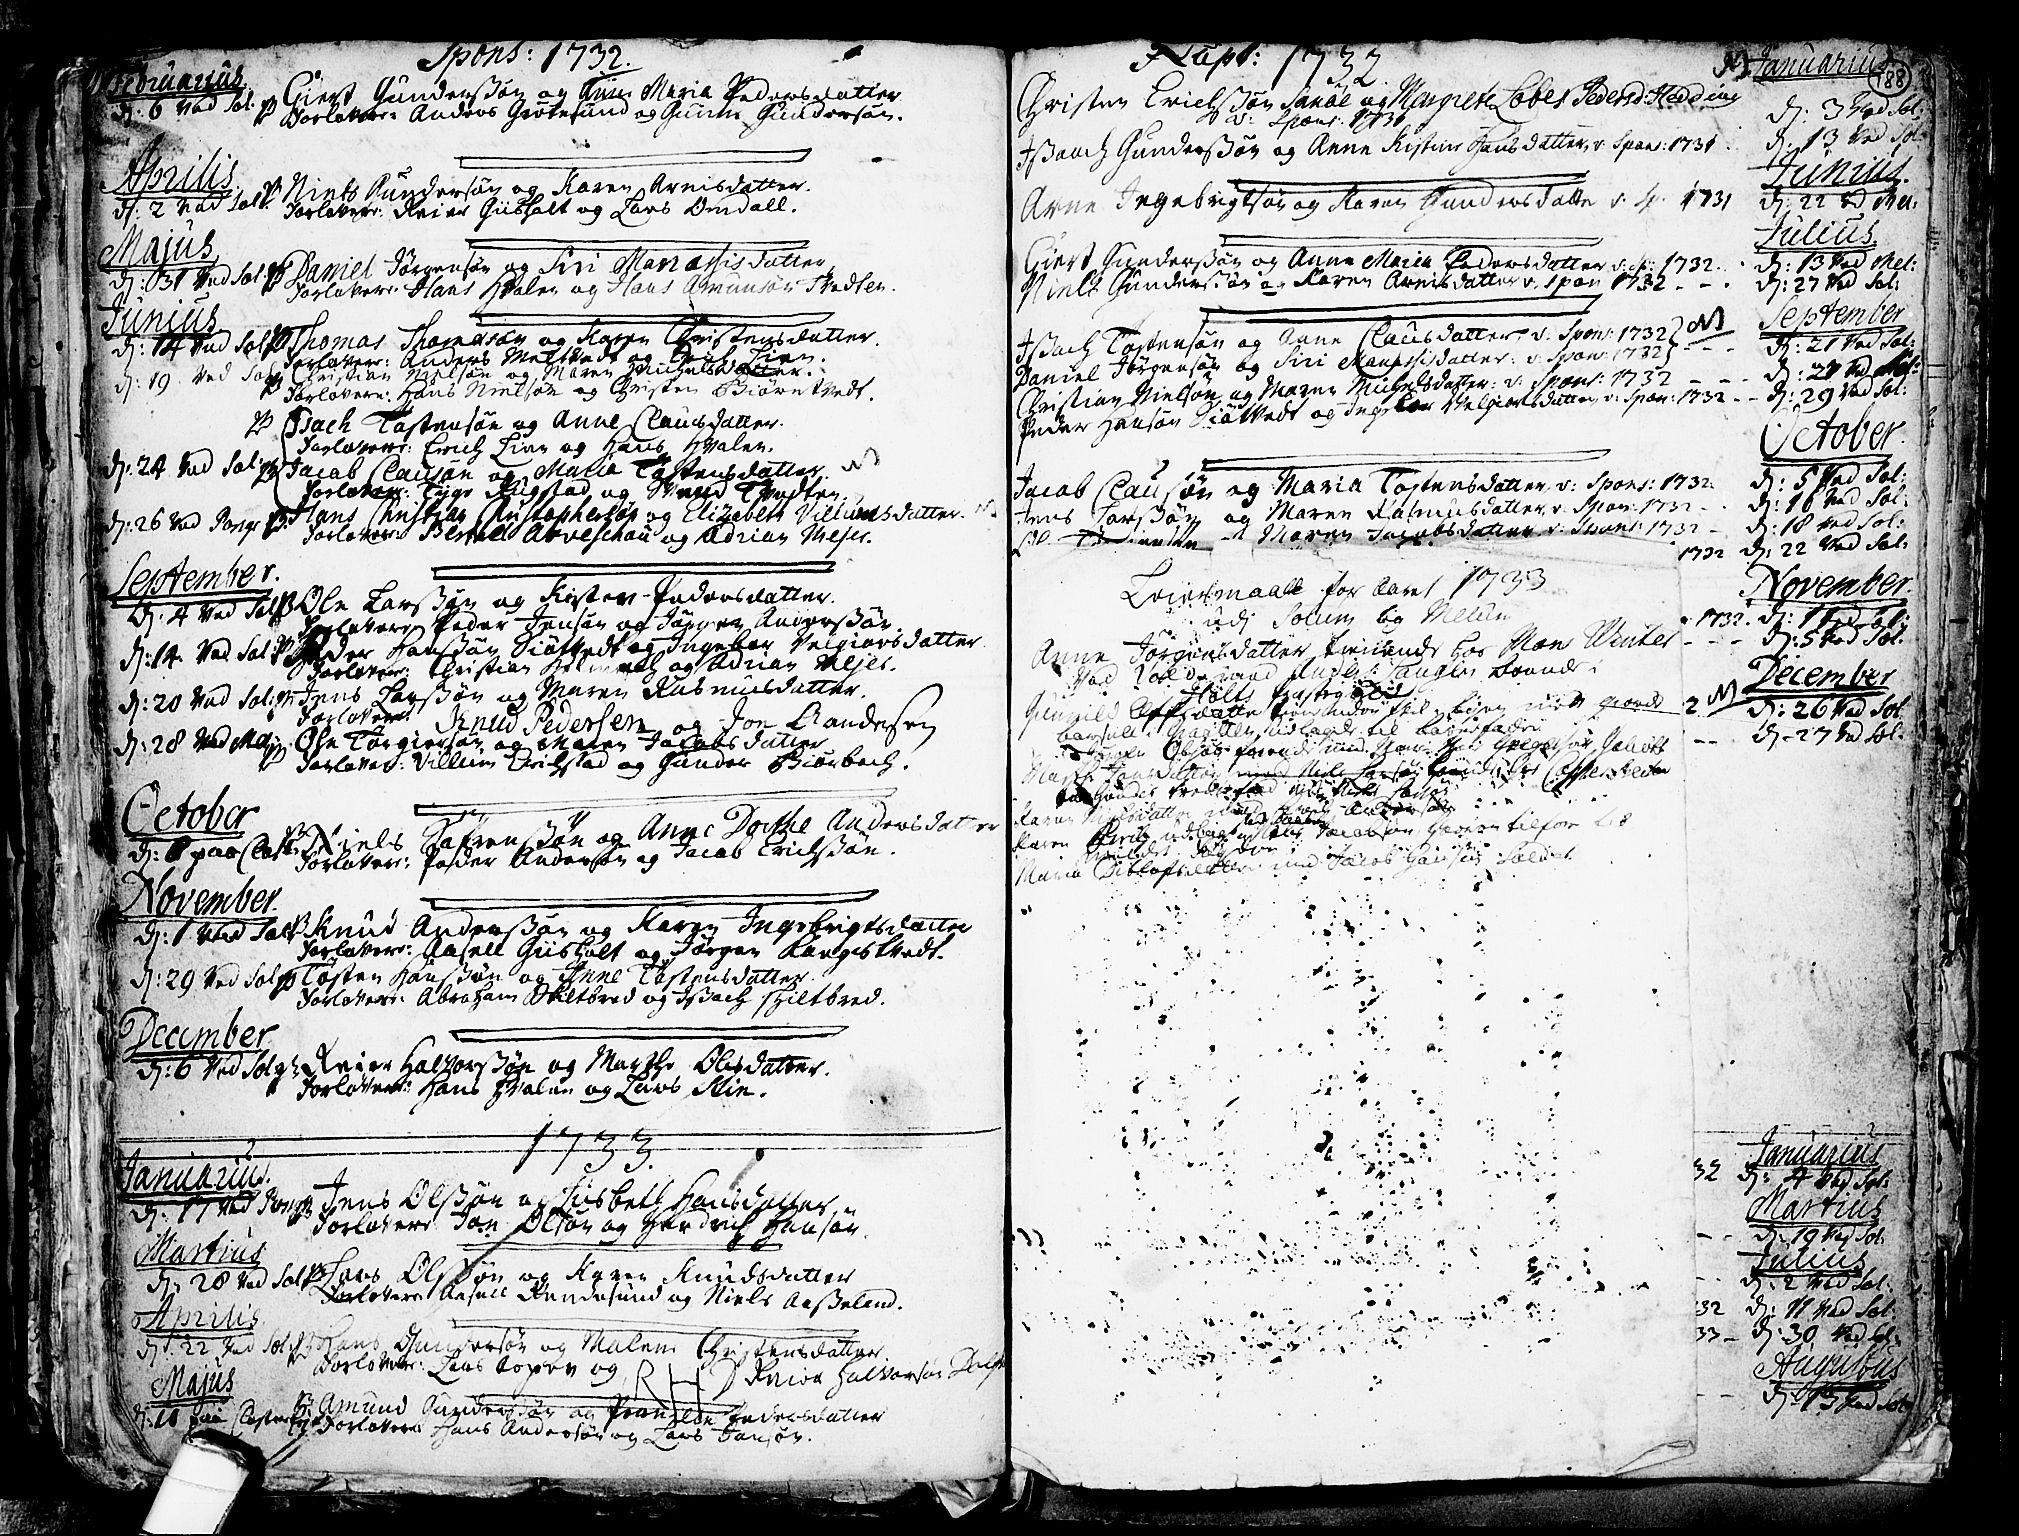 SAKO, Solum kirkebøker, F/Fa/L0002: Ministerialbok nr. I 2, 1713-1761, s. 188